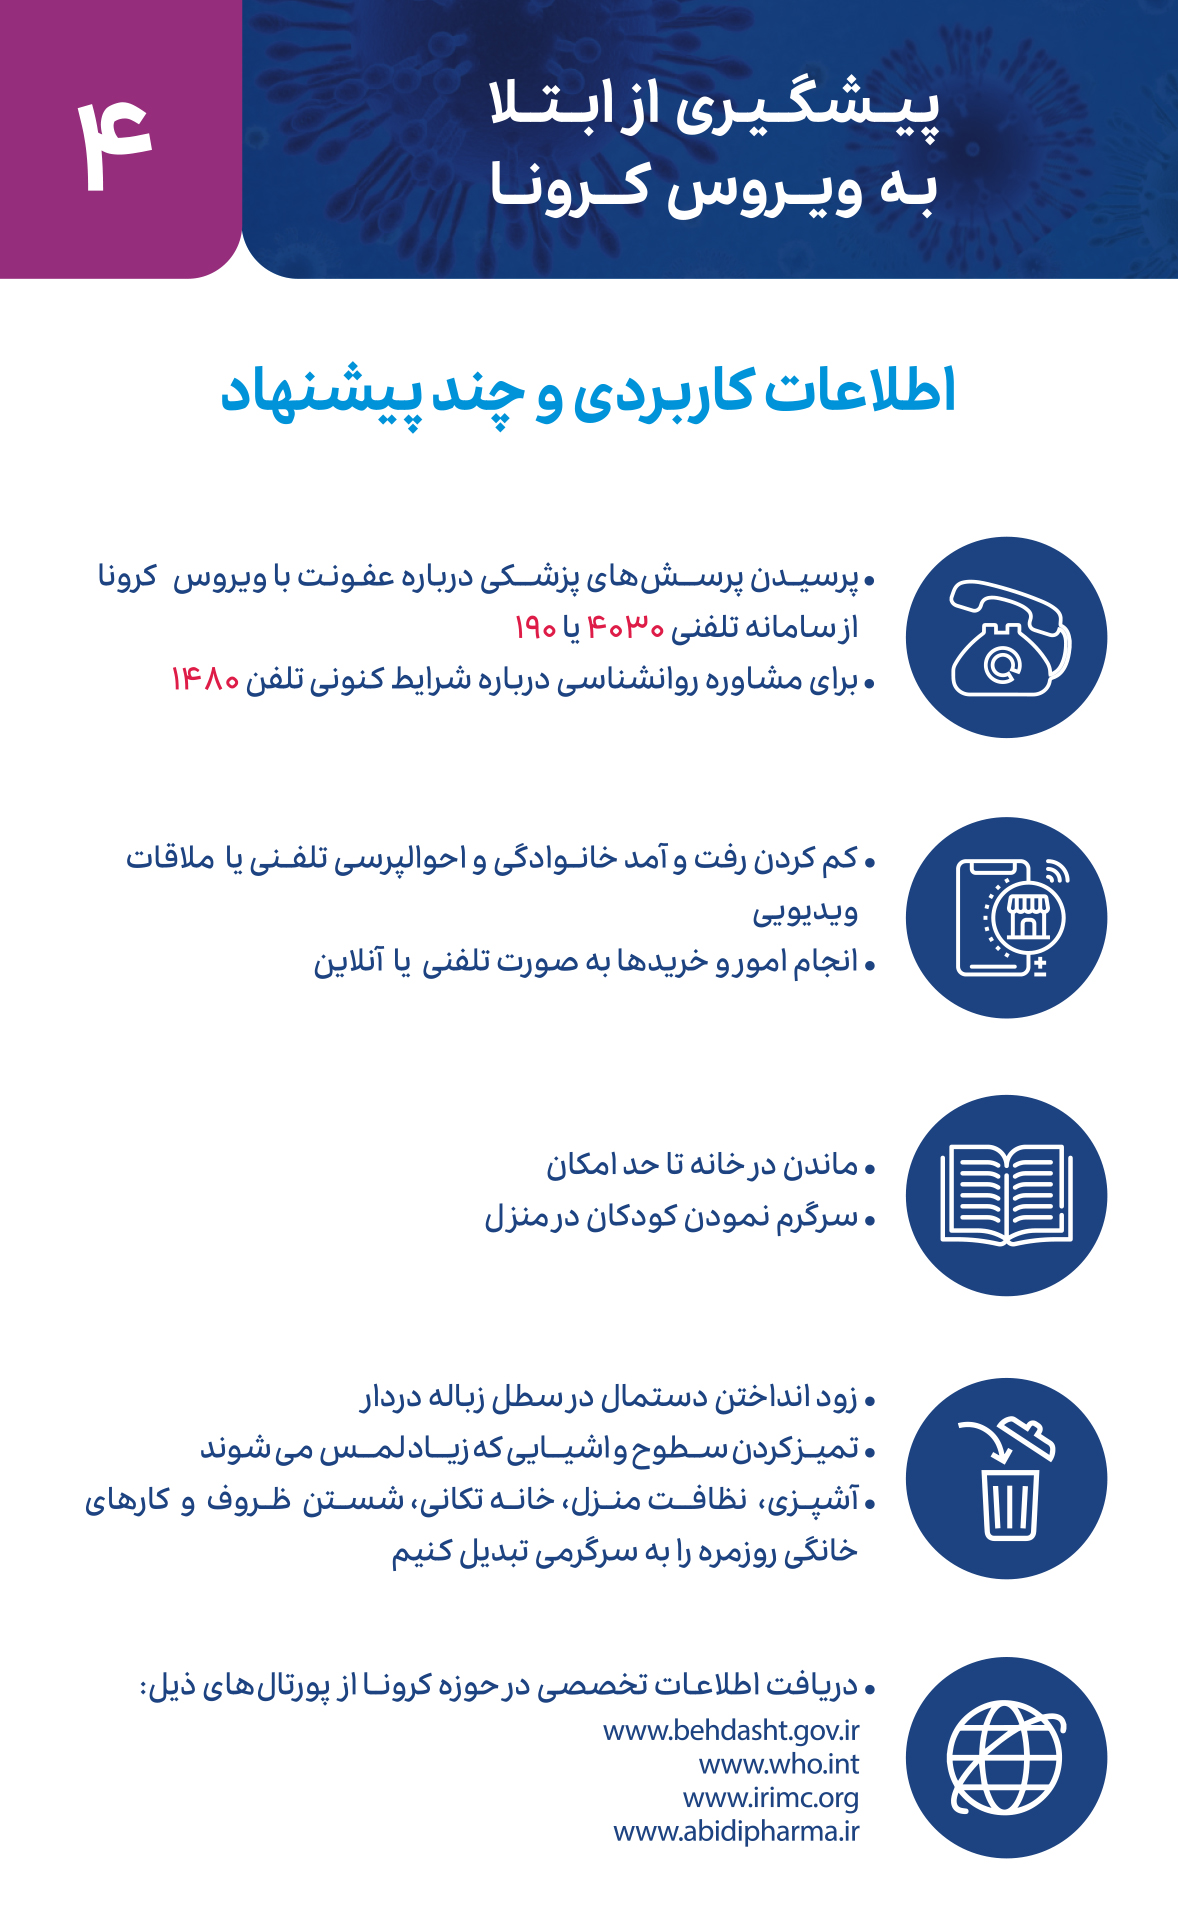 متخصص زنان اصفهان اطلاعات کاربردی ویروس کرونا